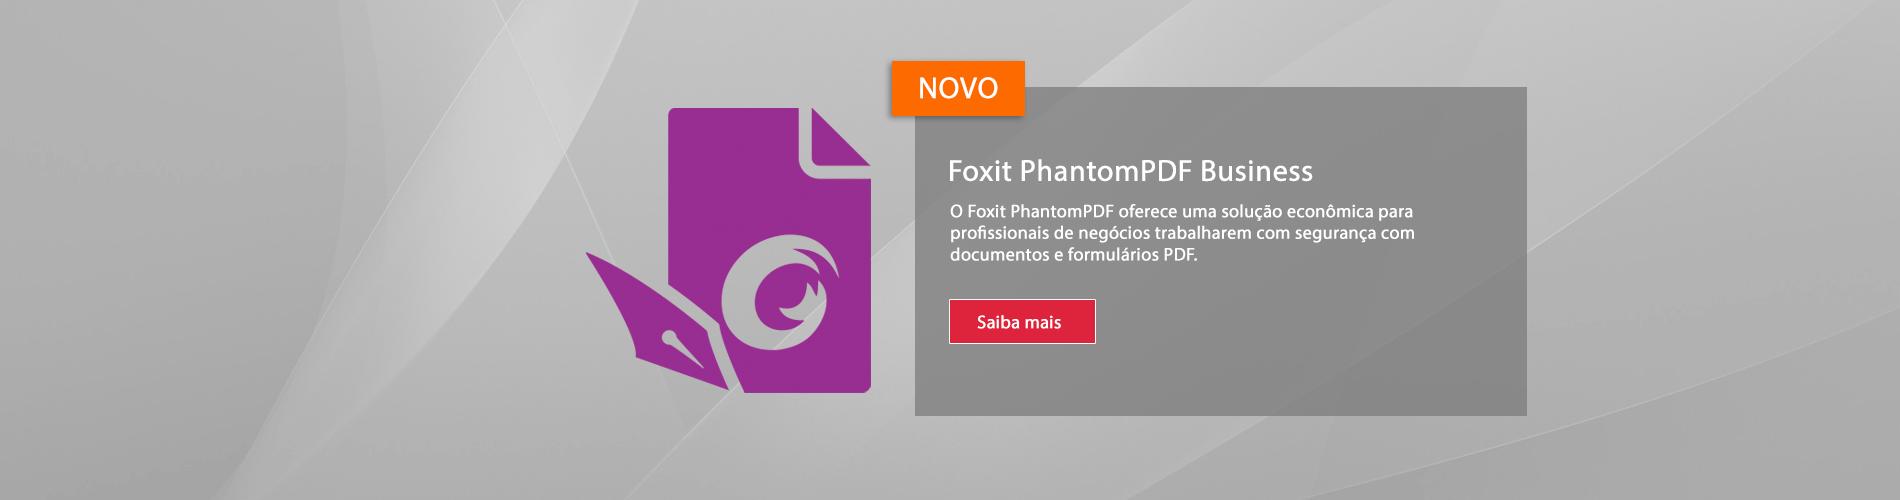 slide_foxitphantompdf